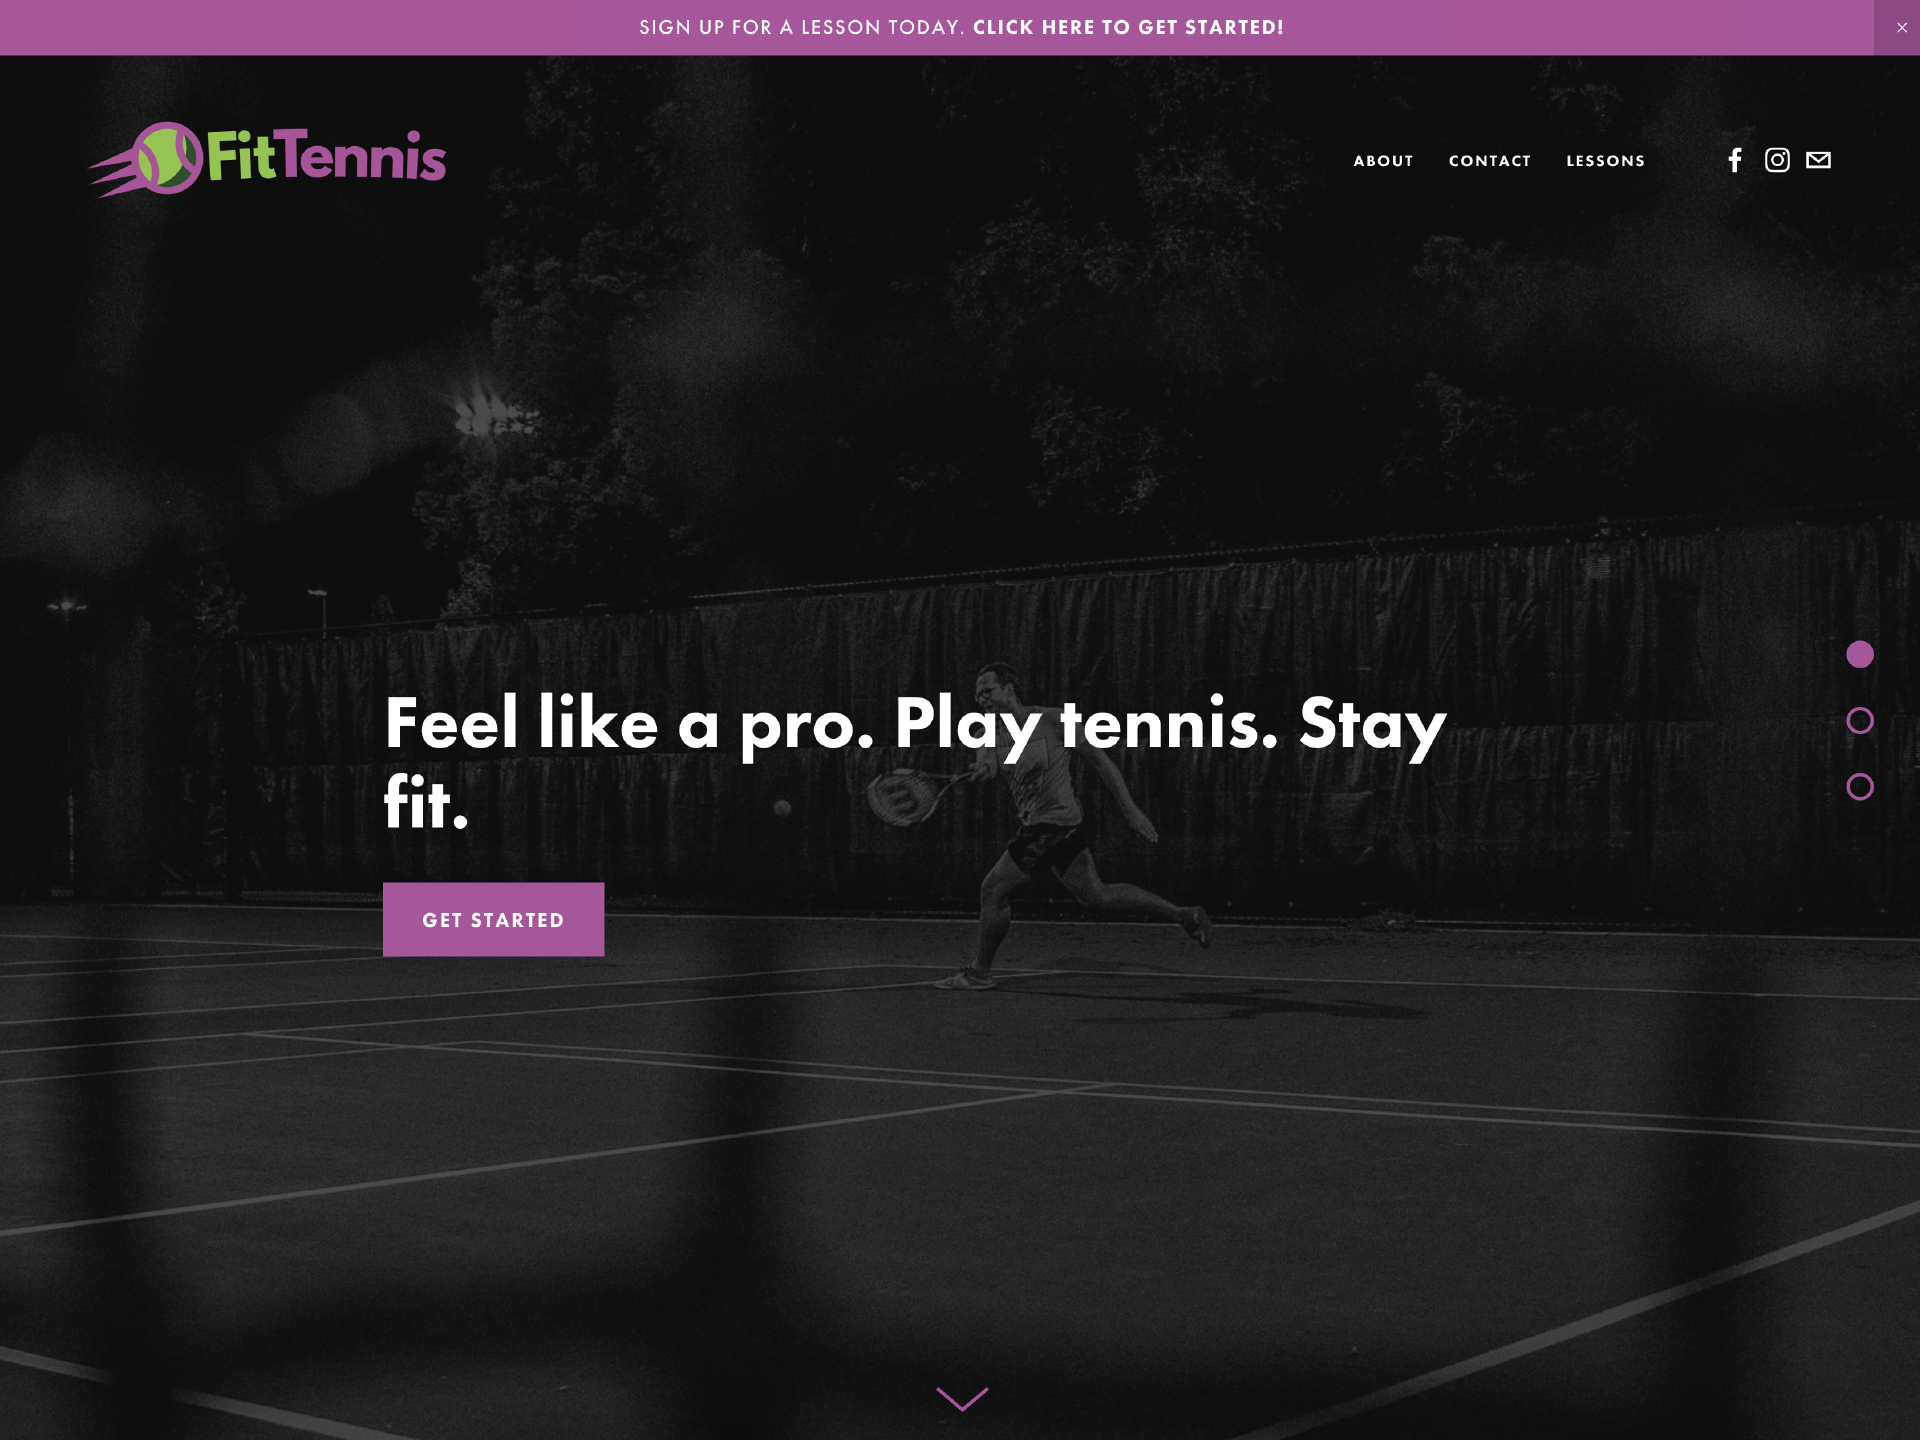 fittennis_screen-01.png